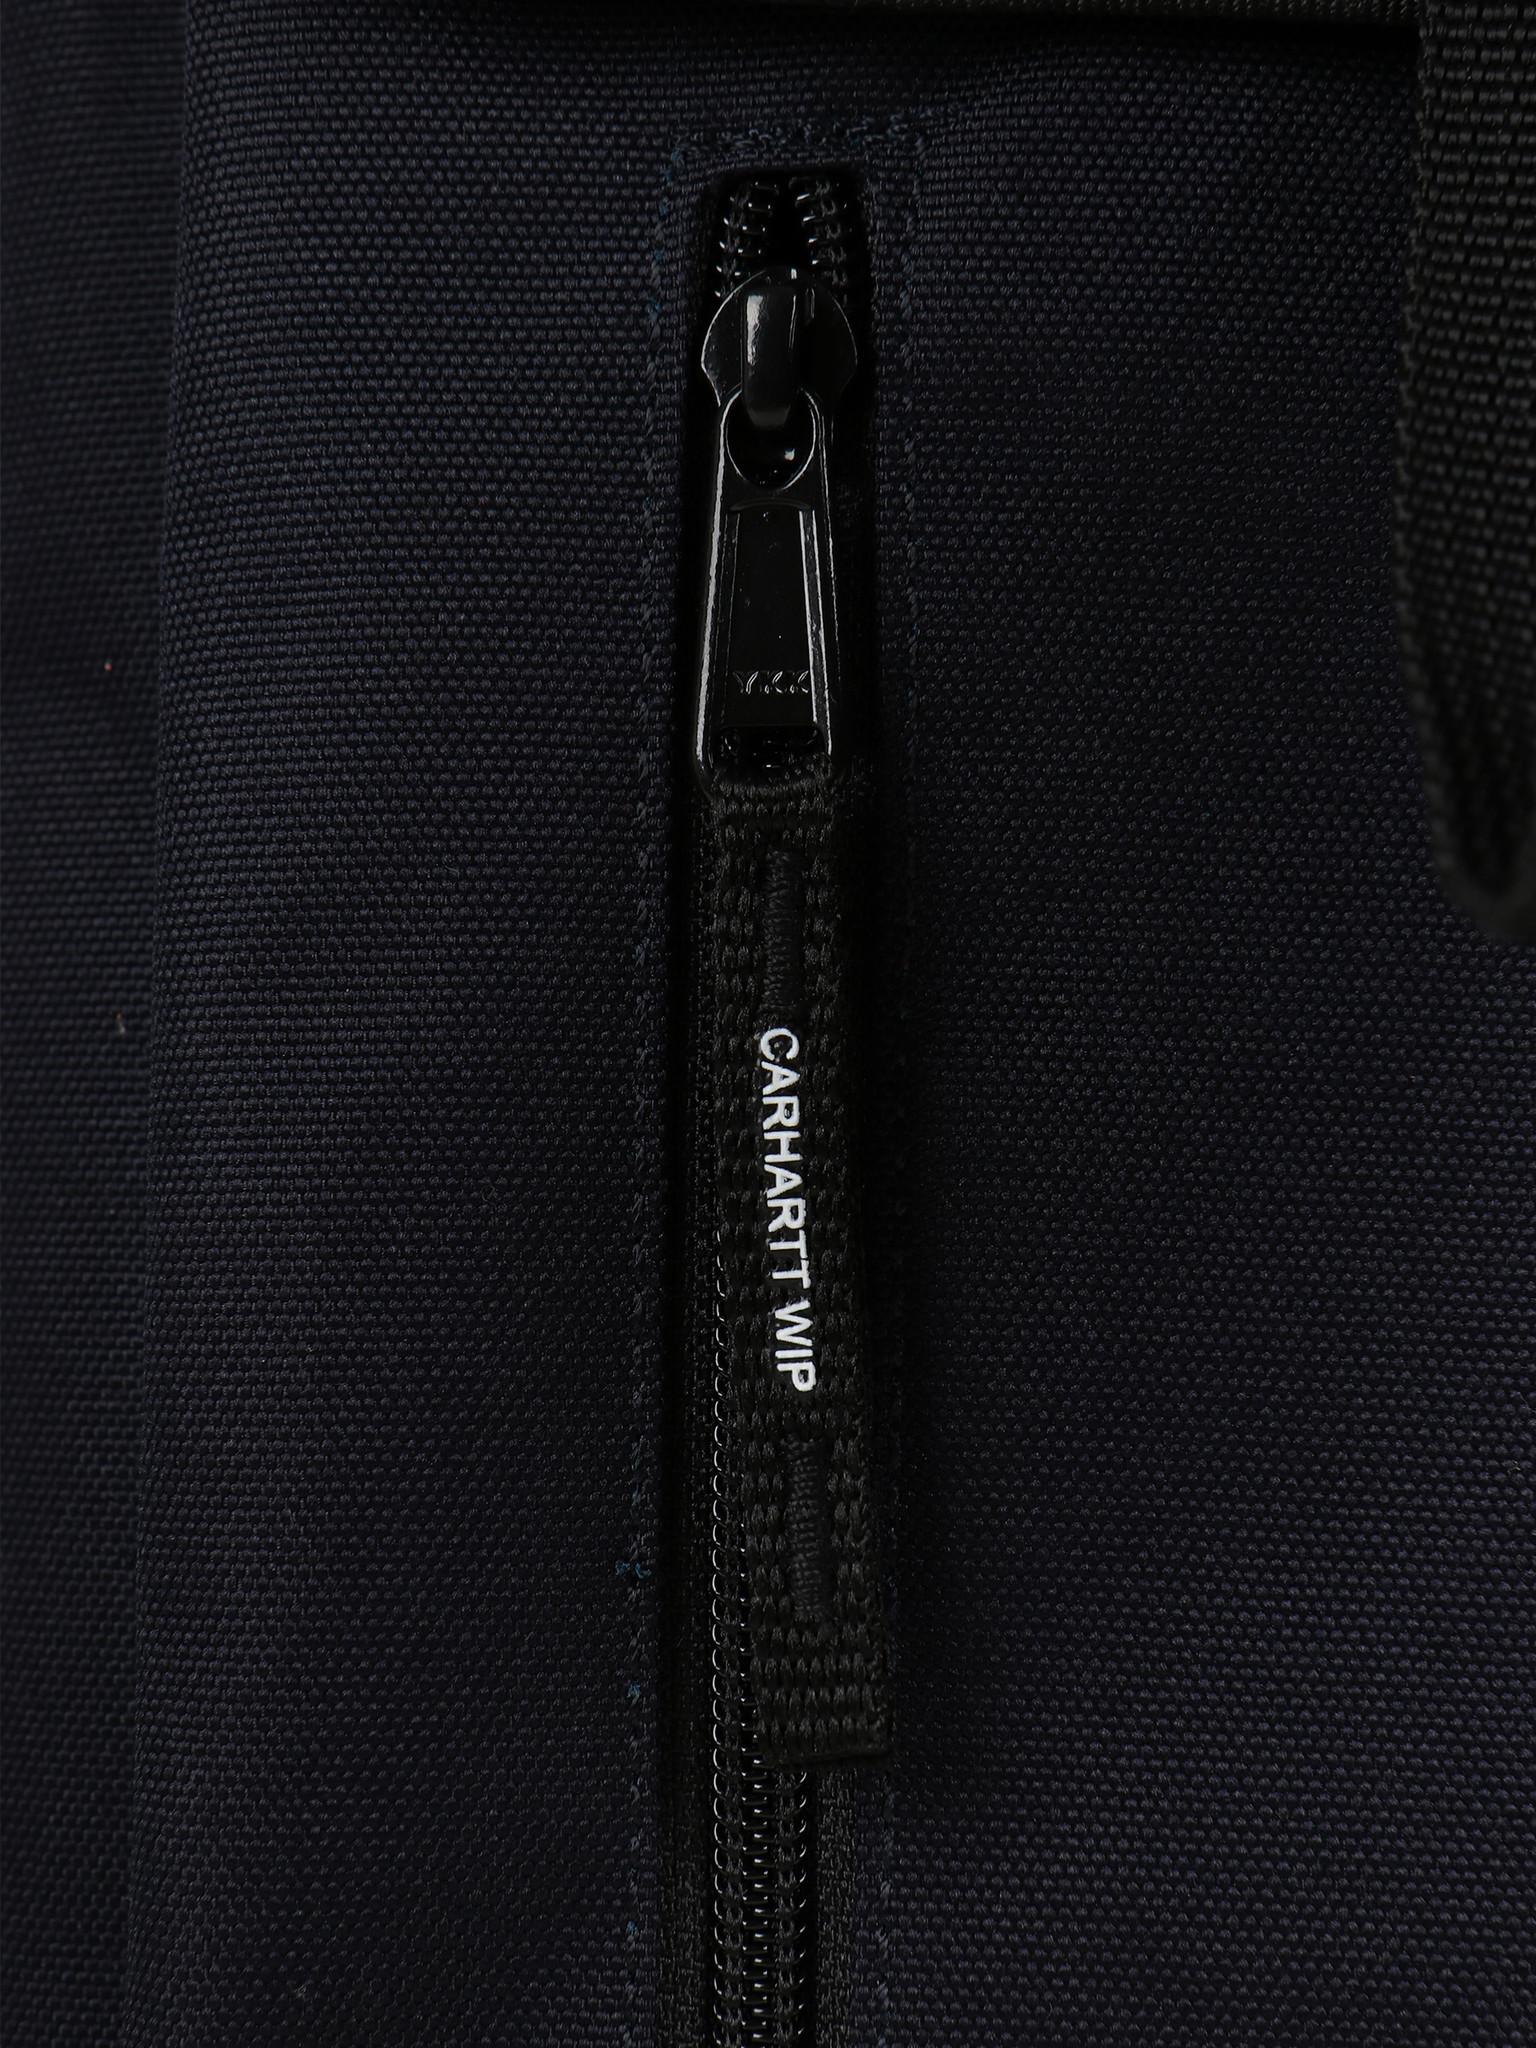 Carhartt WIP Carhartt WIP Philis Backpack Dark Navy I026177-1C00